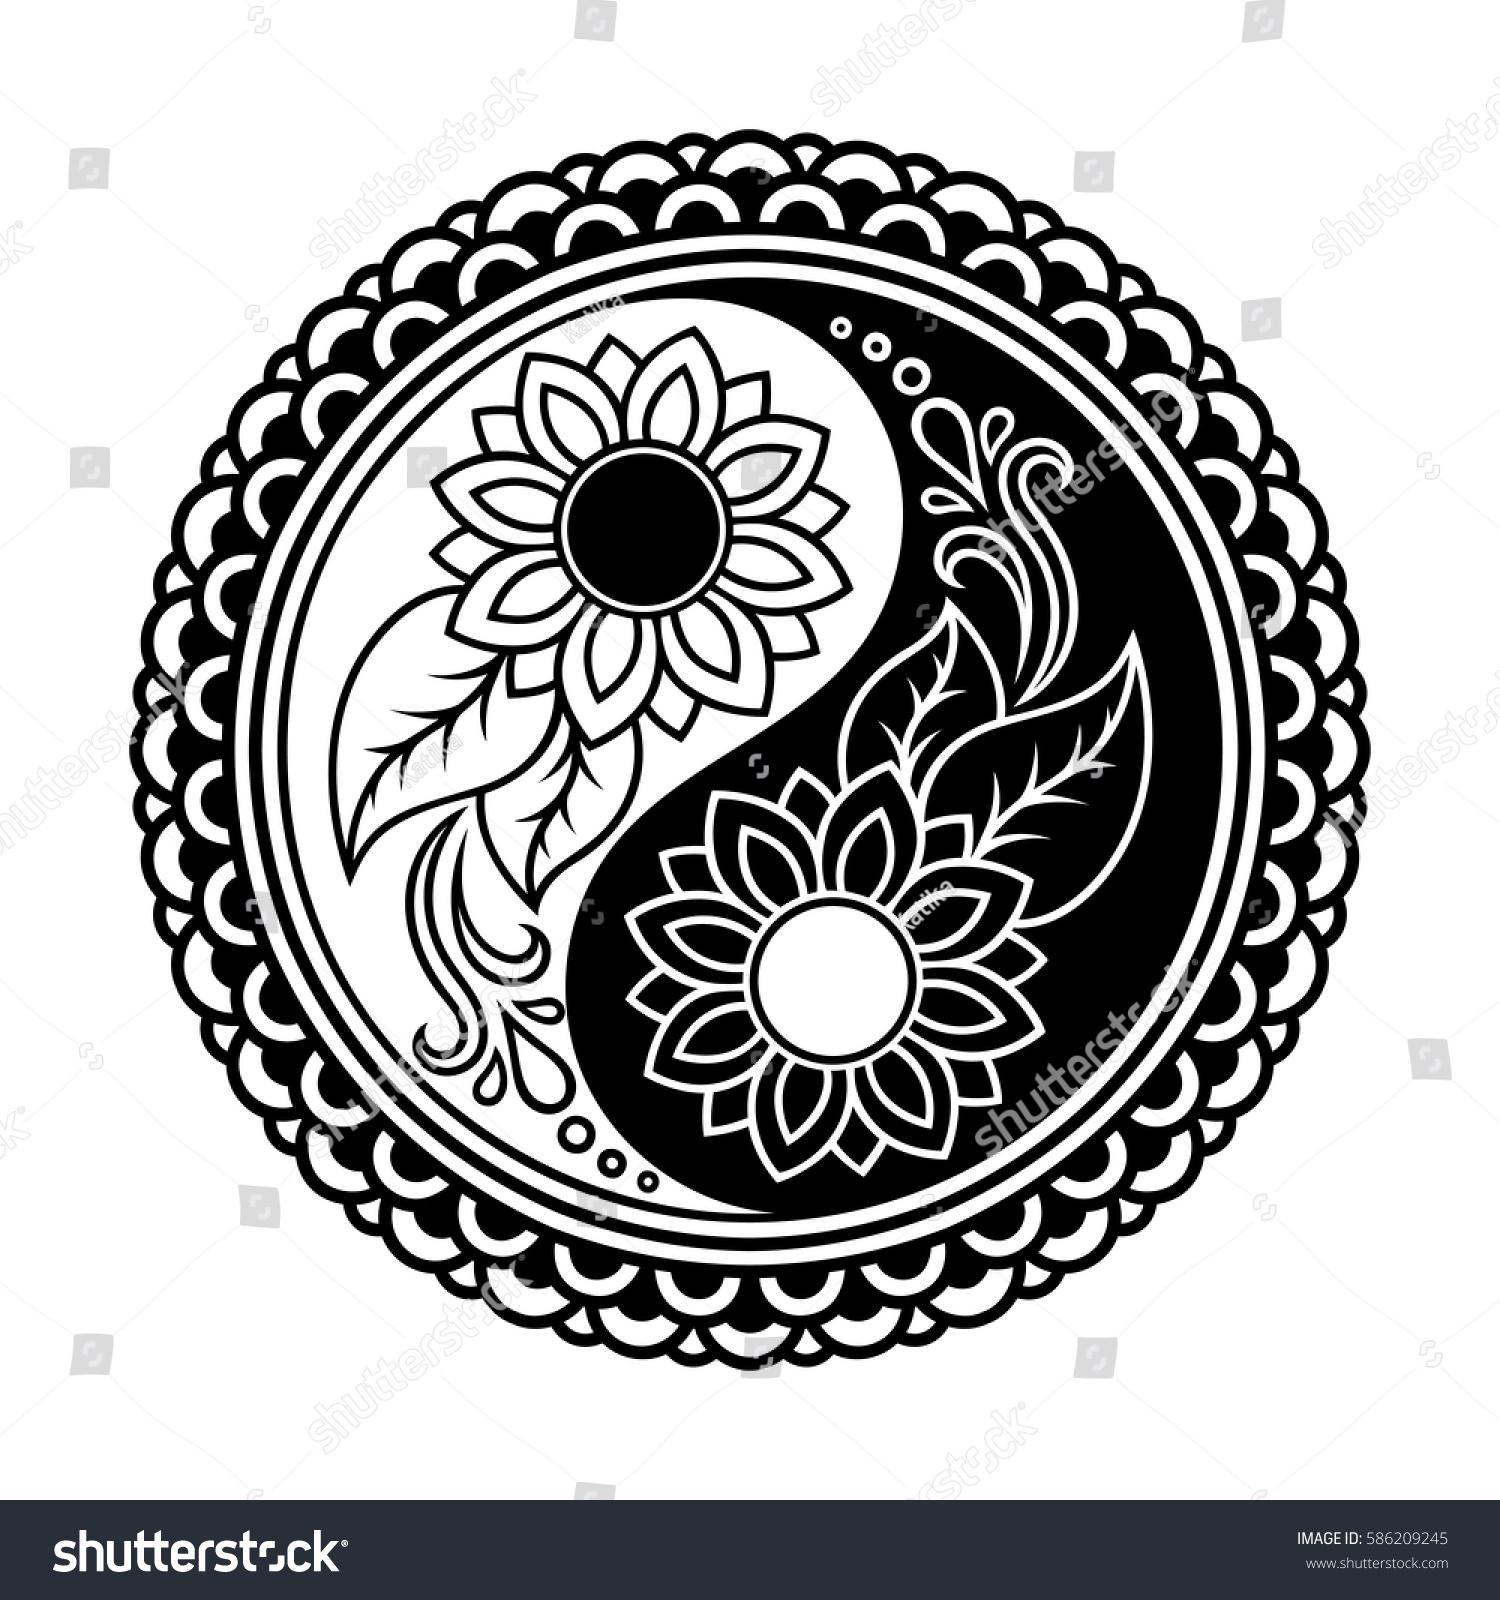 Coloring pages yin yang - Yin Yang Decorative Symbol Mehndi Style Mehndi Style